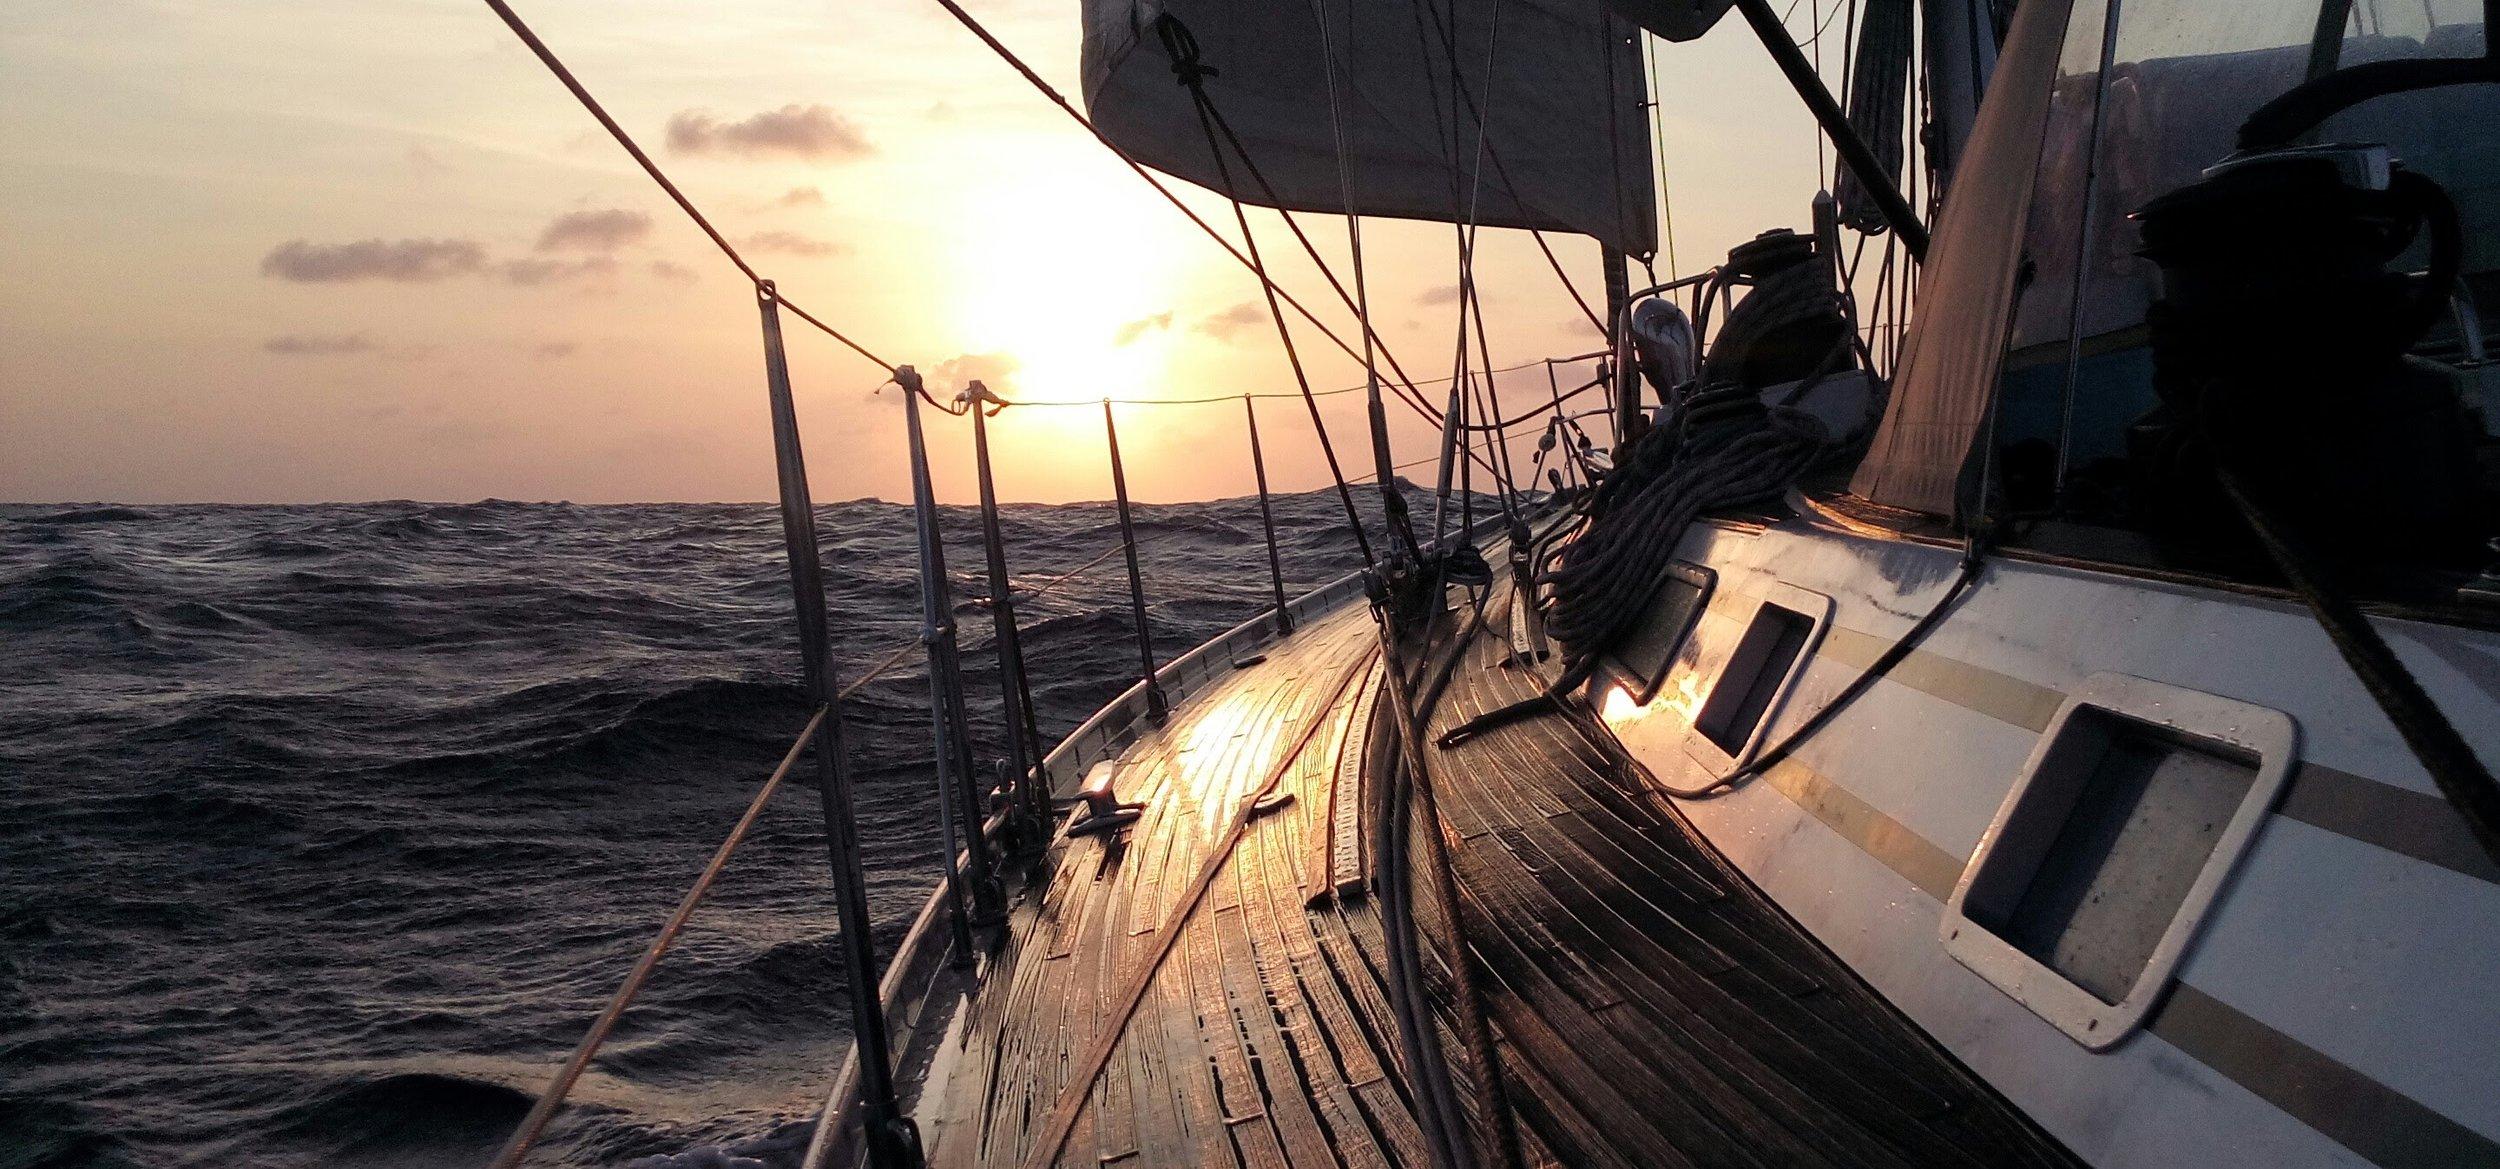 THINDRA en route across the Atlantic.